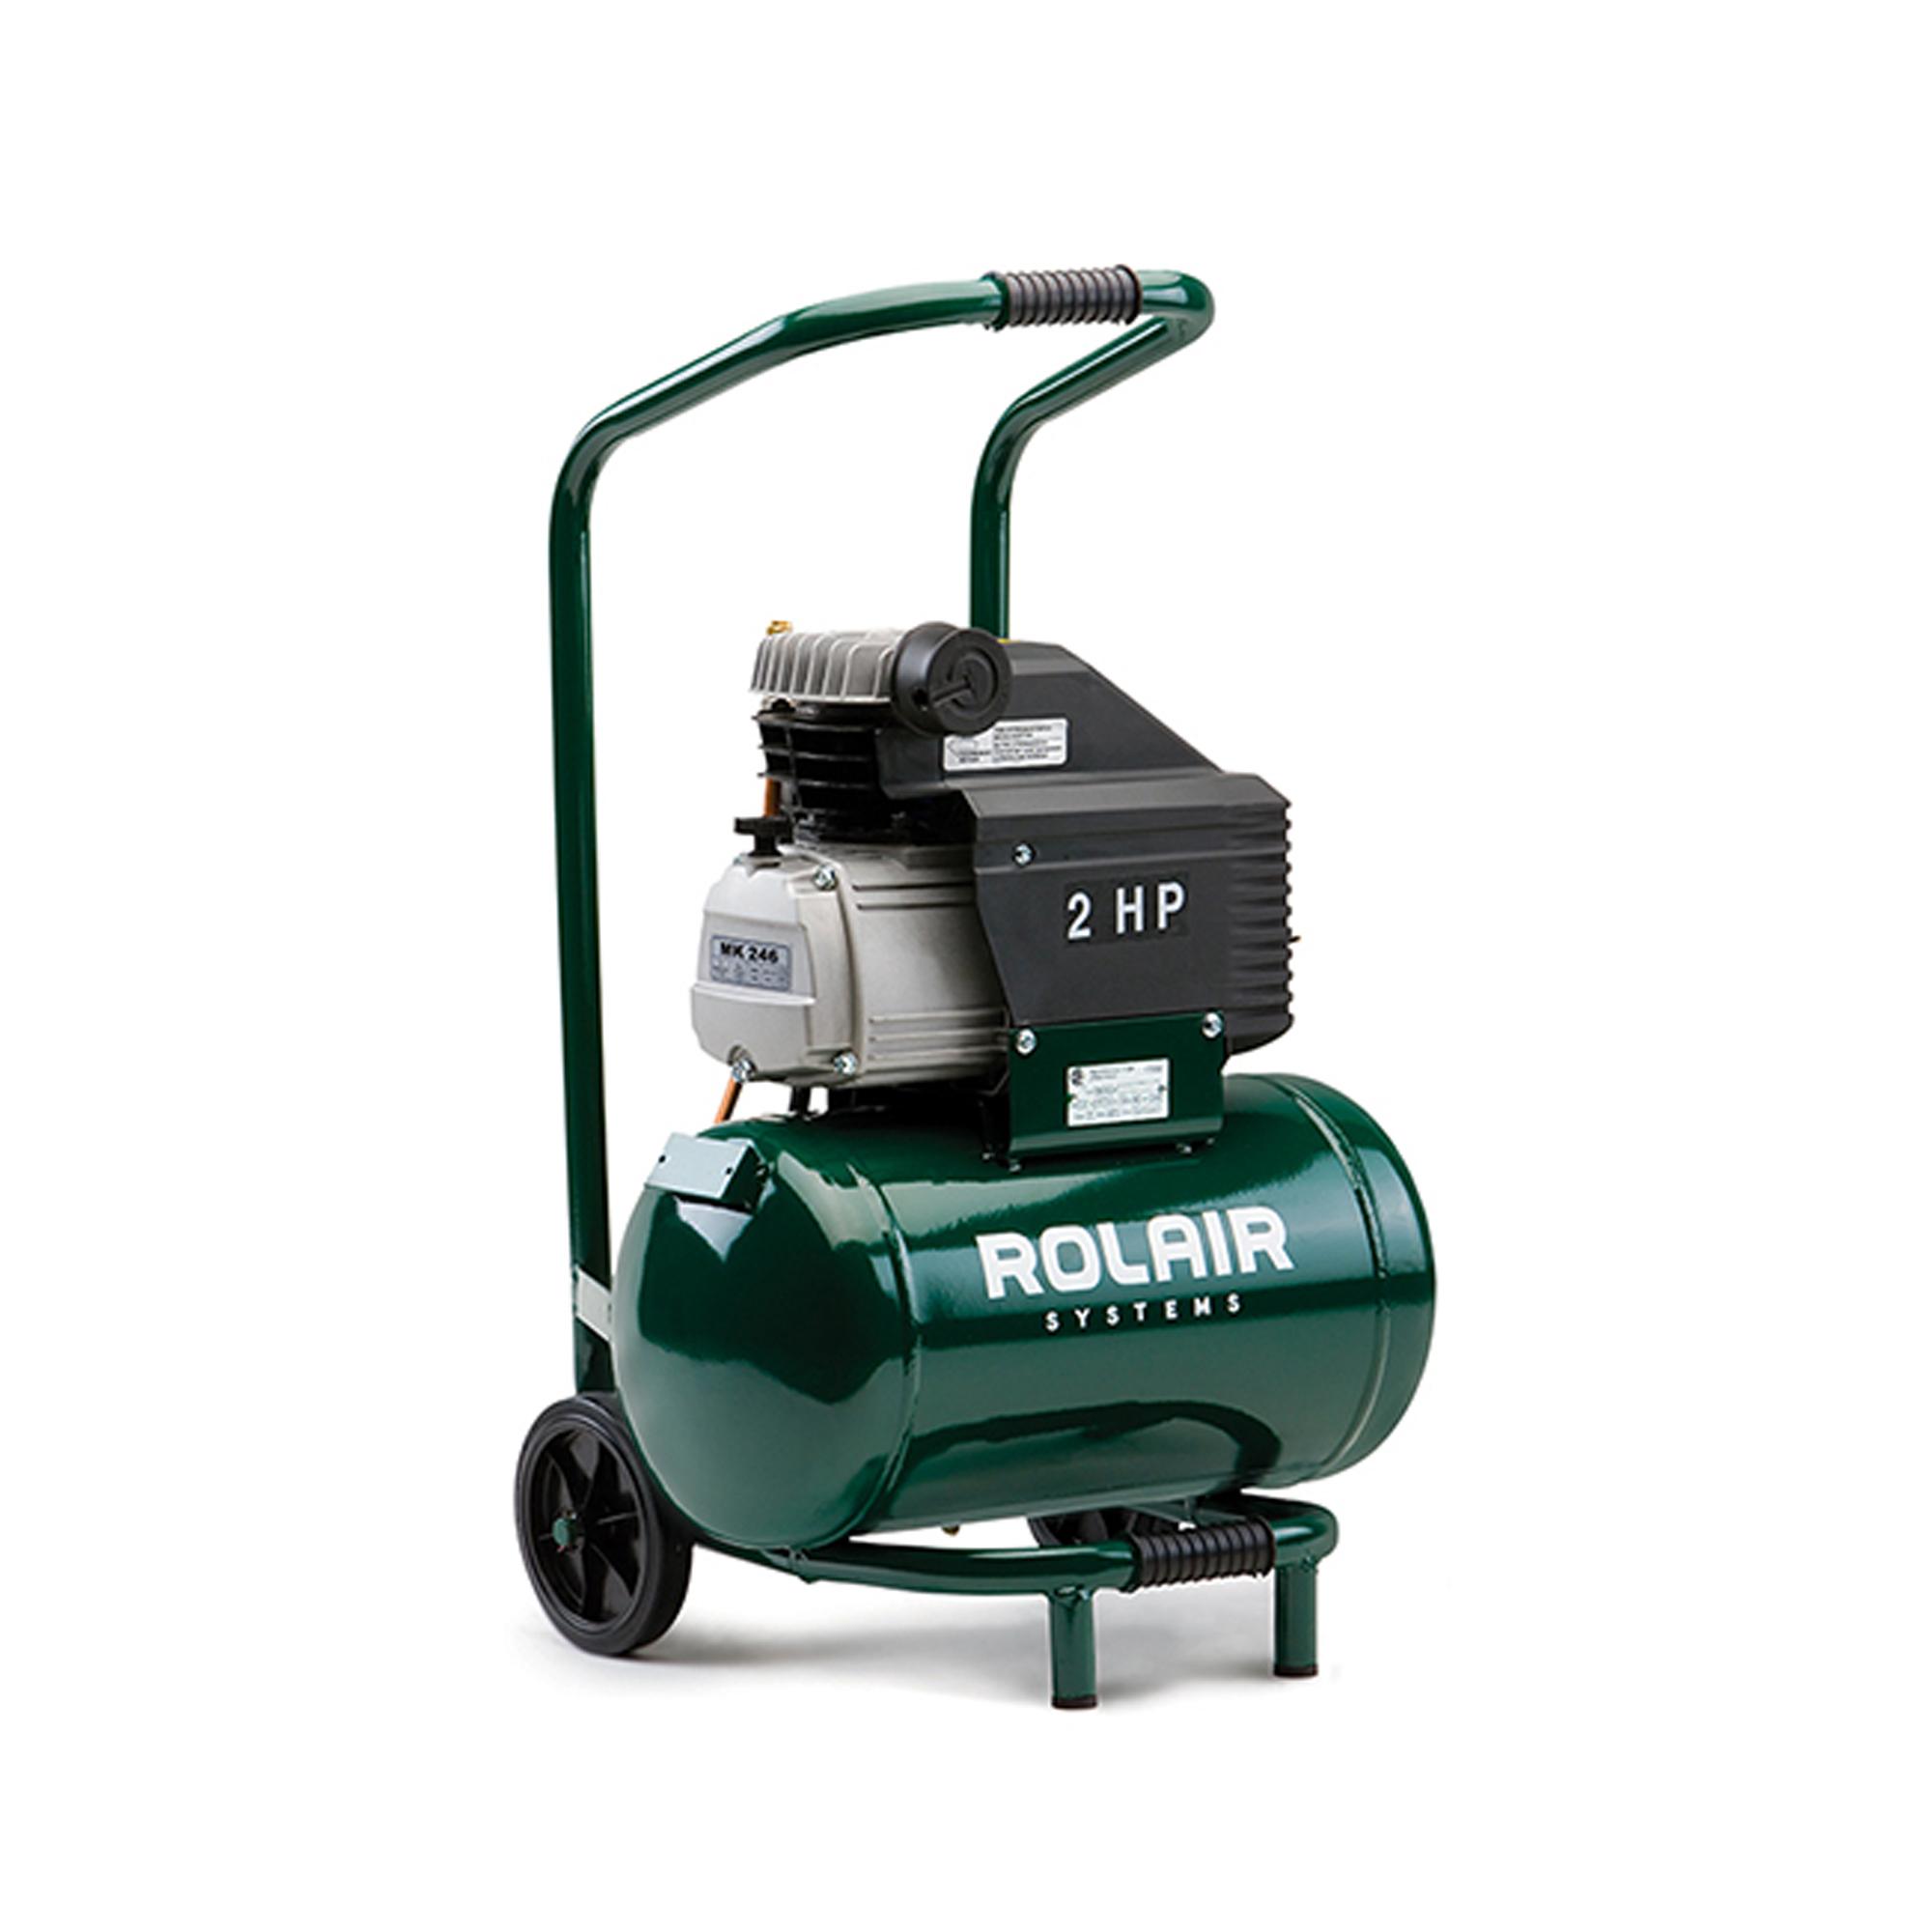 De S About Rolair Fc2002hbp Gallon Electric Wheeled Portable Home Use Air Compressor